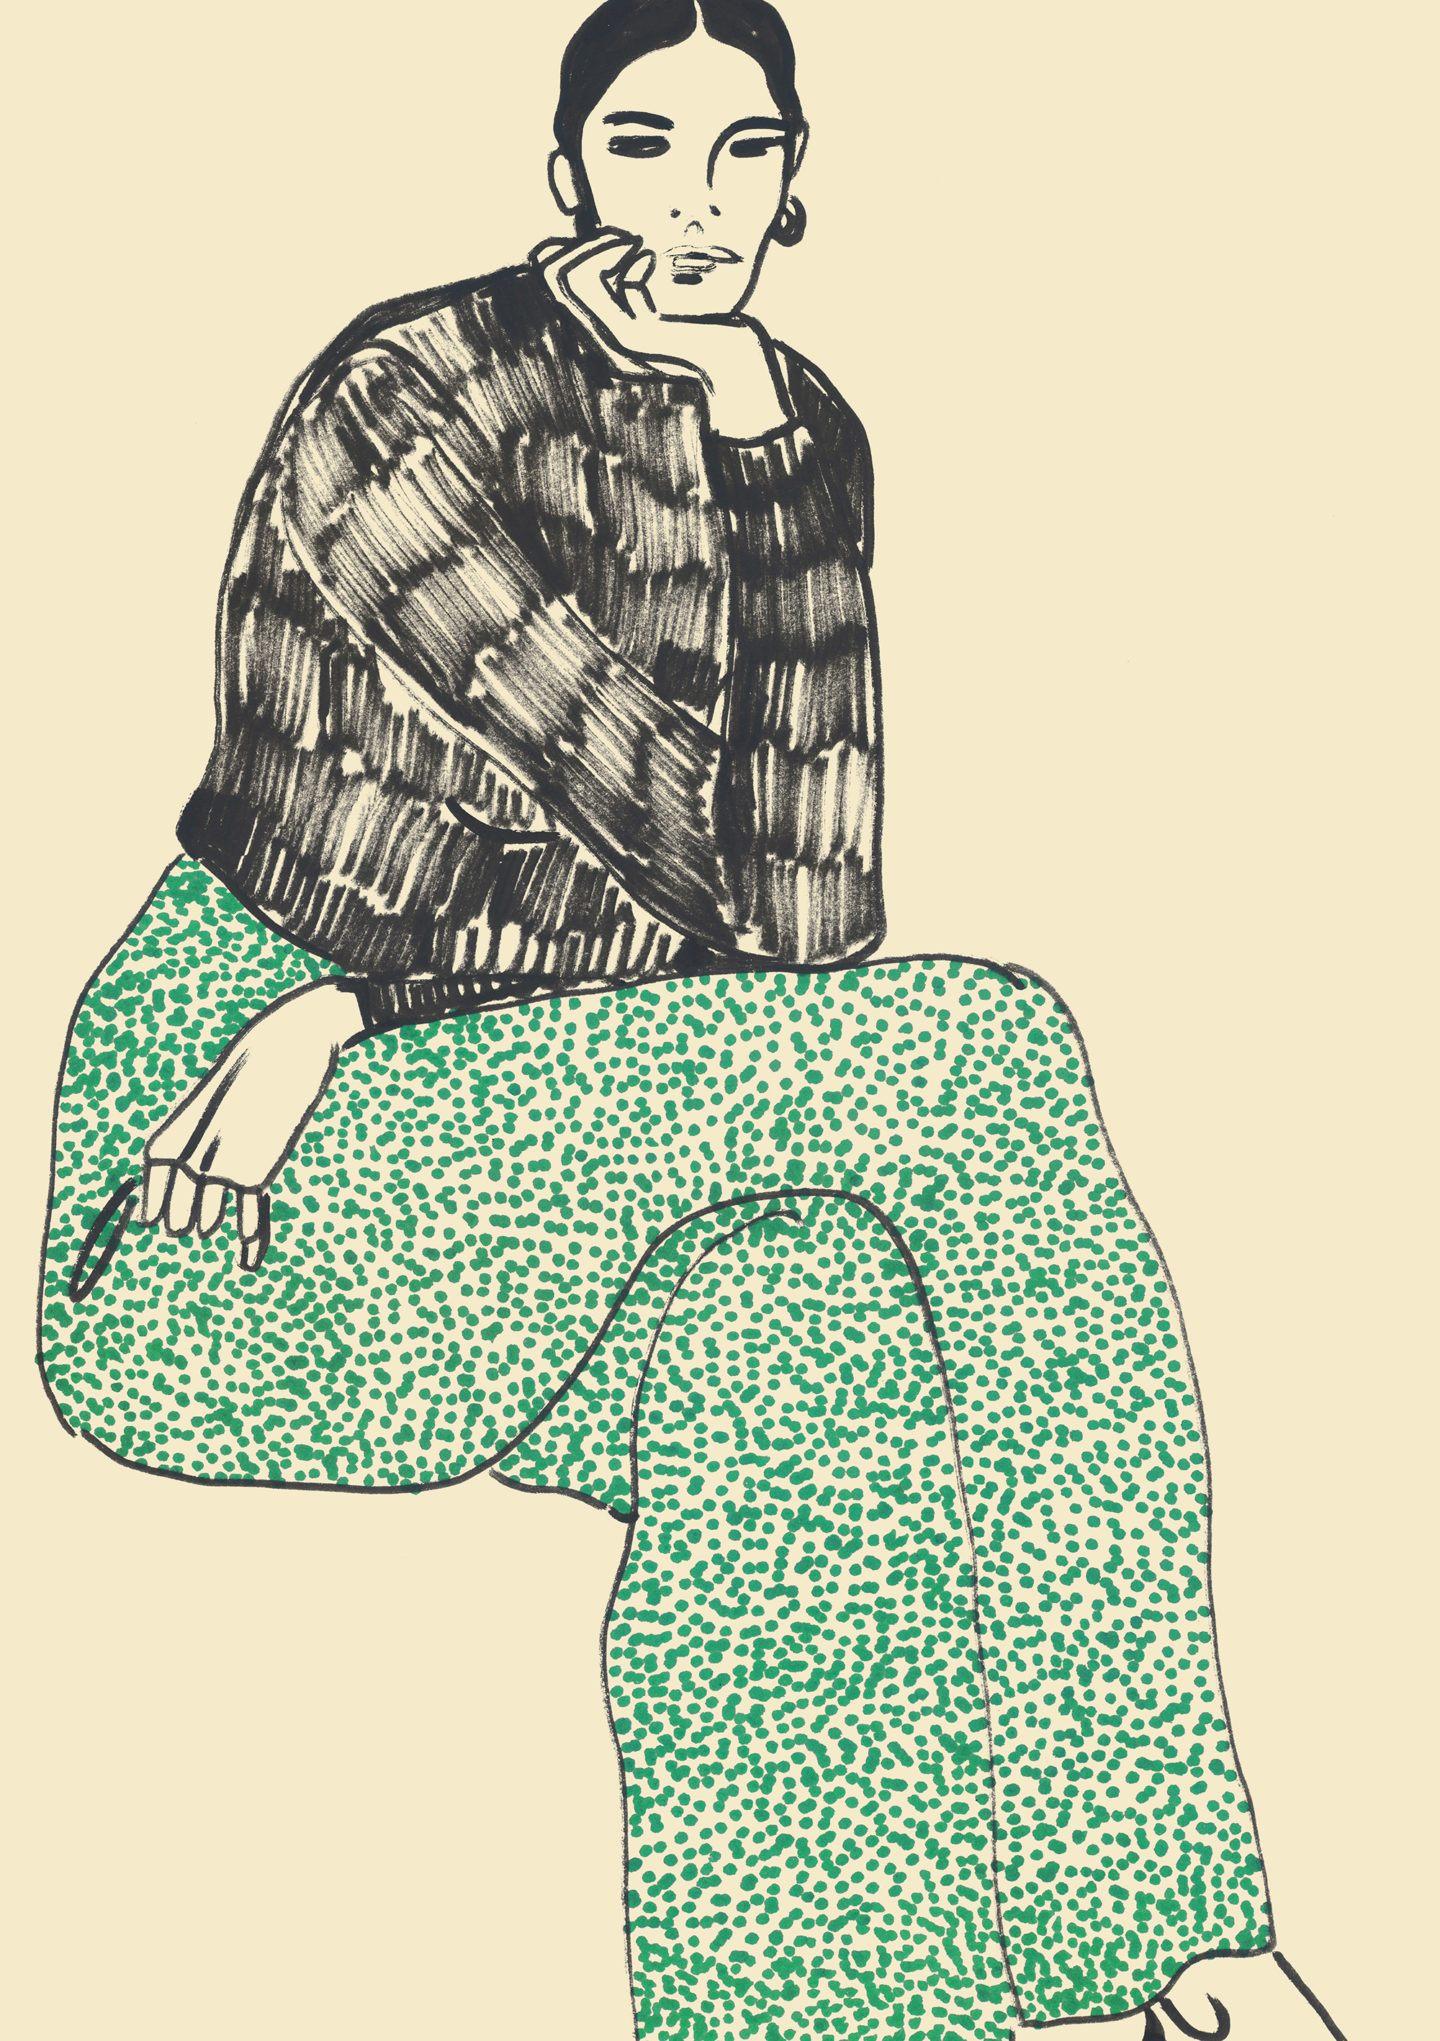 IGNANT-Art-Rosie-McGuinness-3